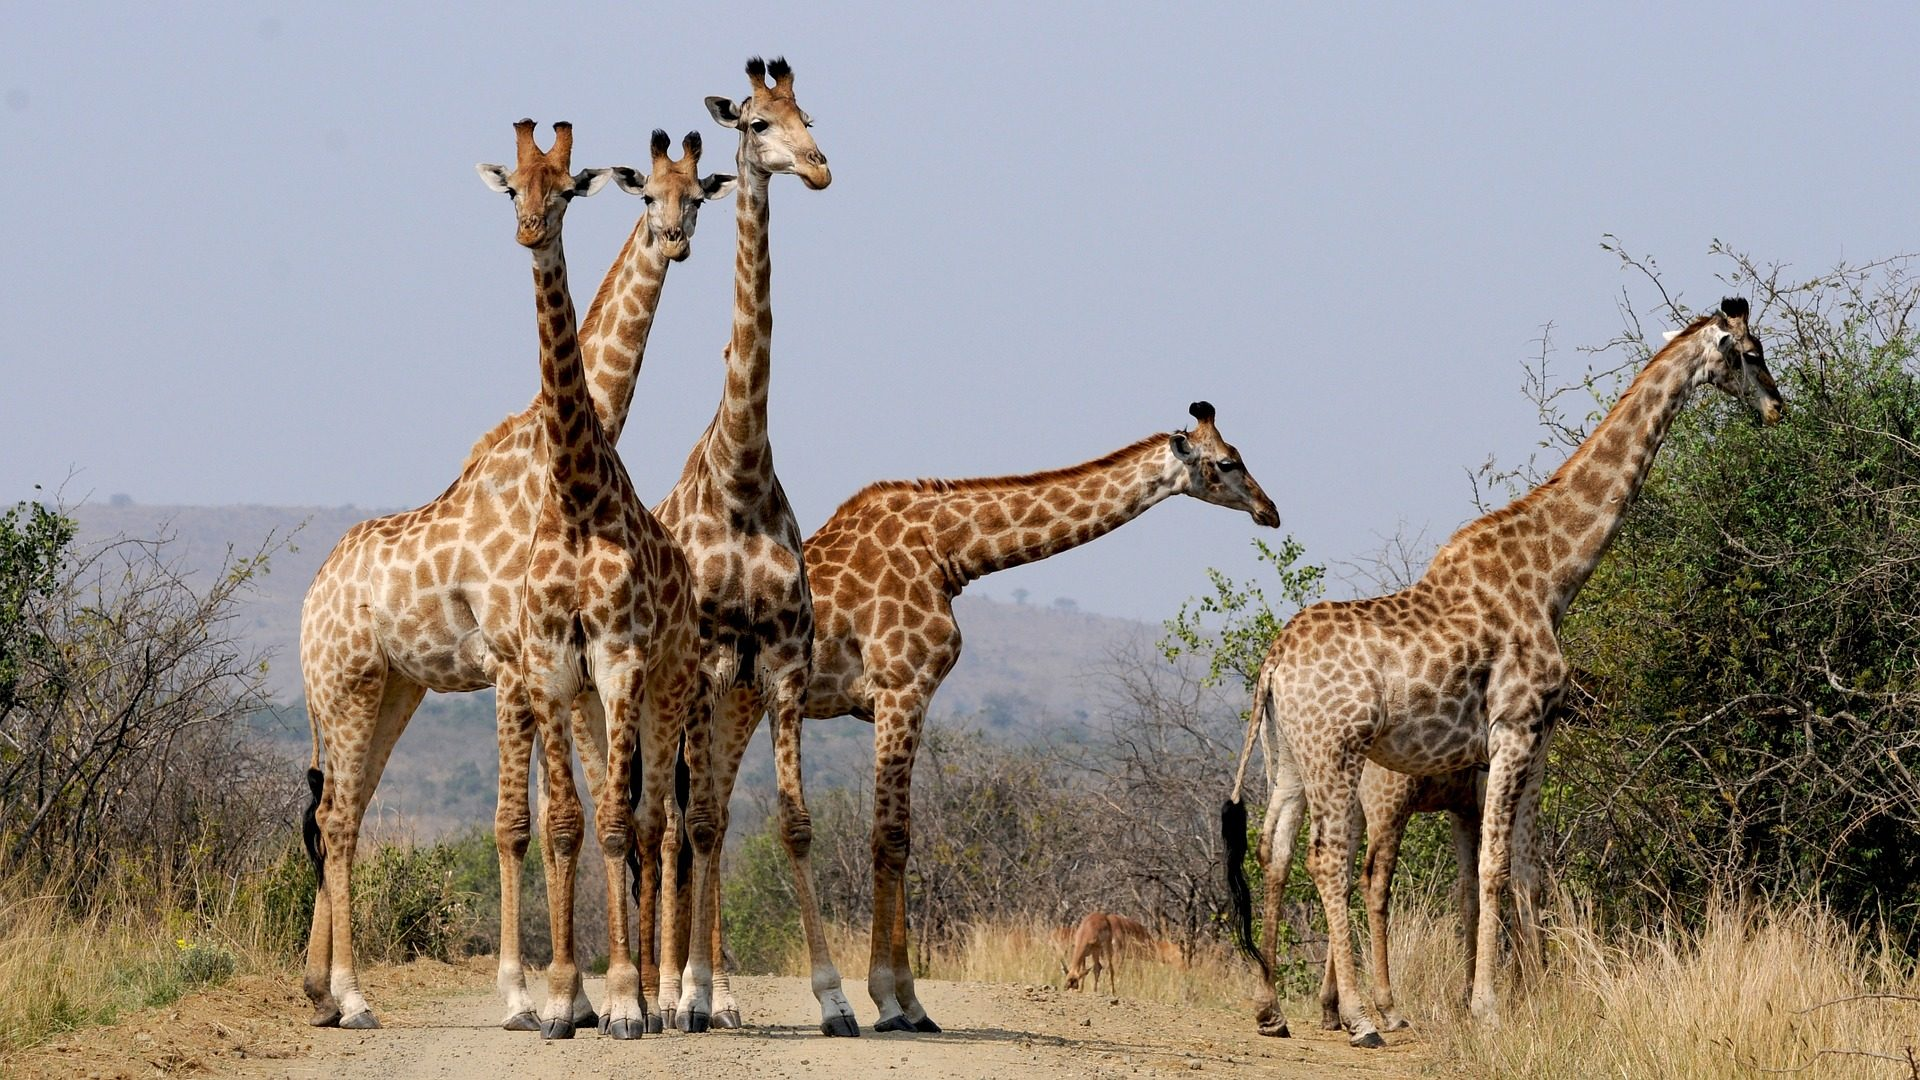 grahamstown-hotels-zuid-afrika